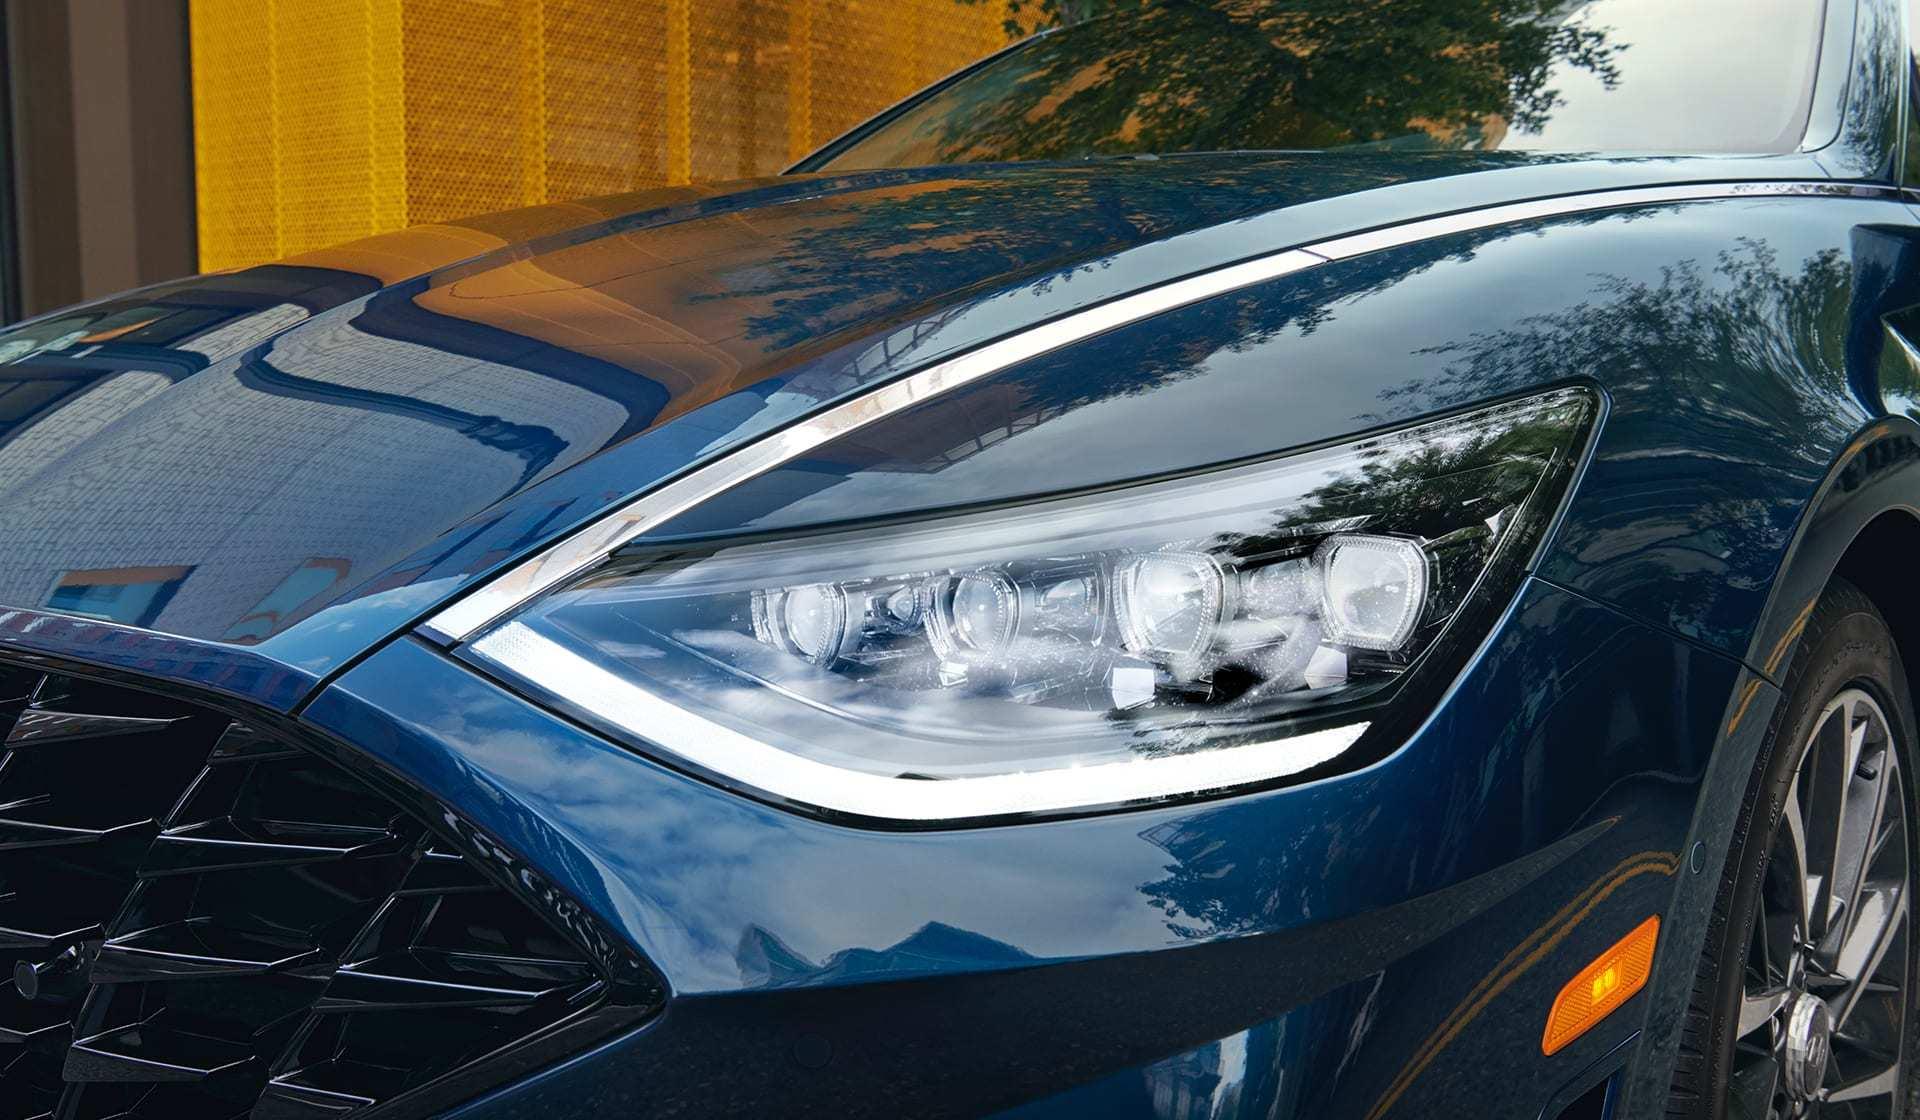 Exterior Details on the 2020 Hyundai Sonata